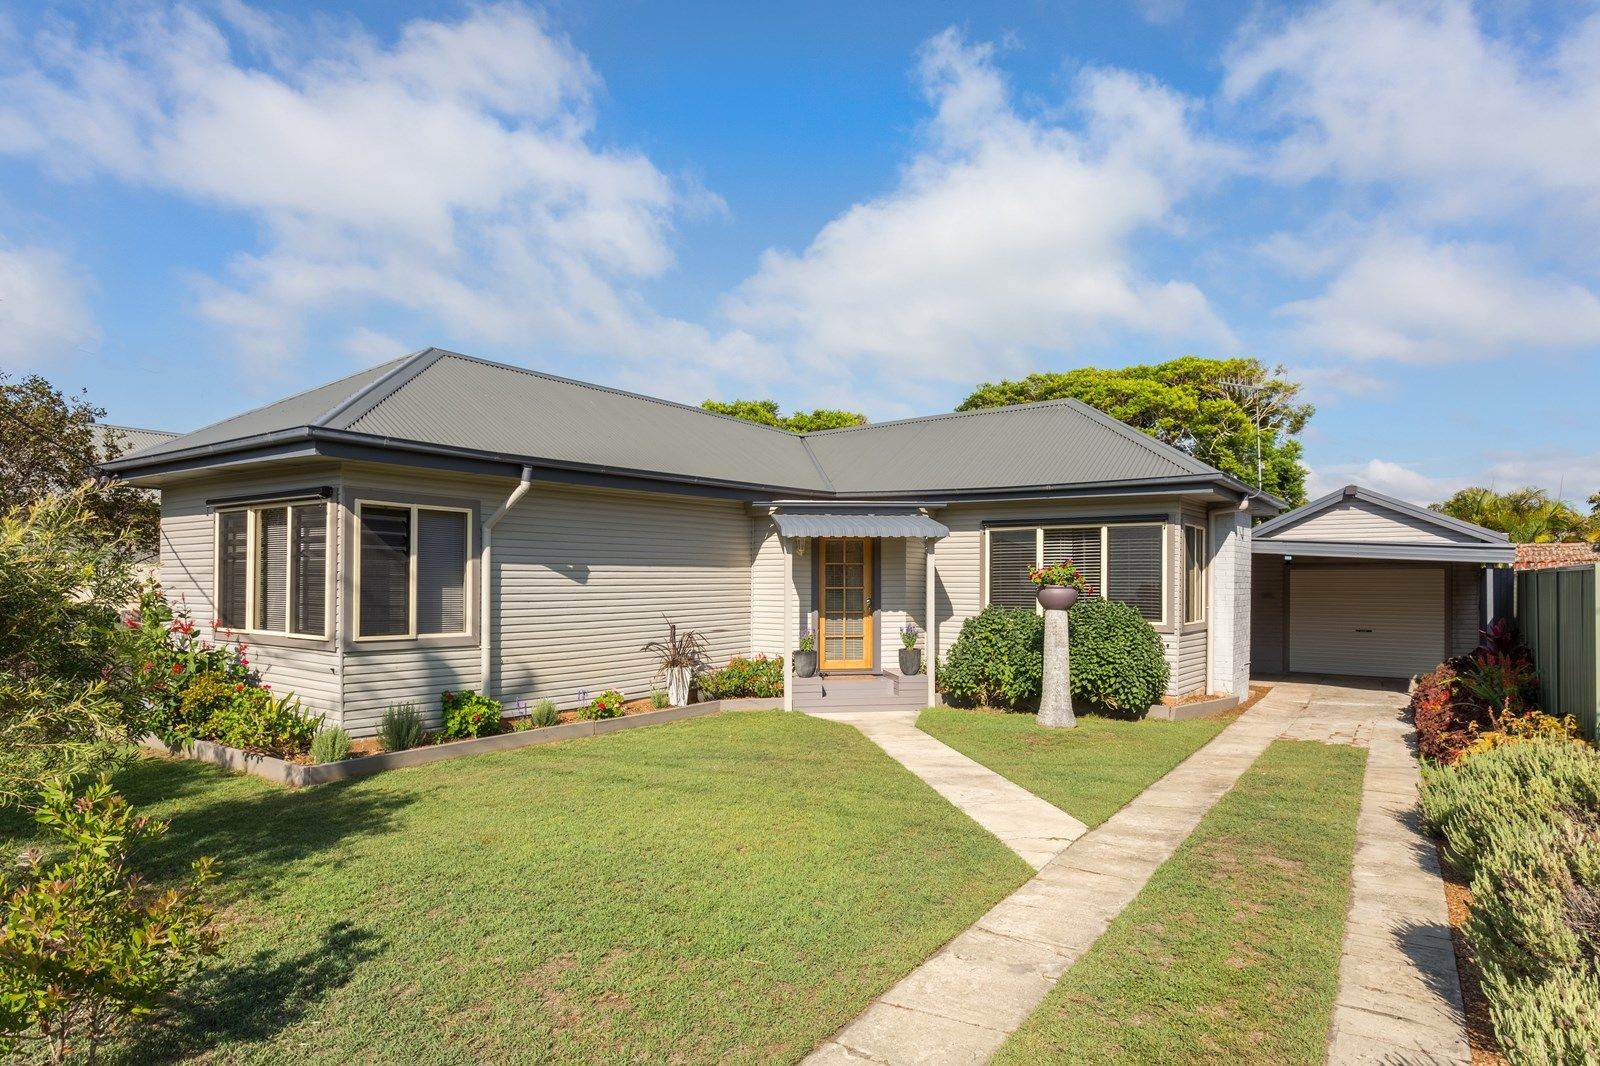 9 Breckenridge Street, Forster NSW 2428, Image 1